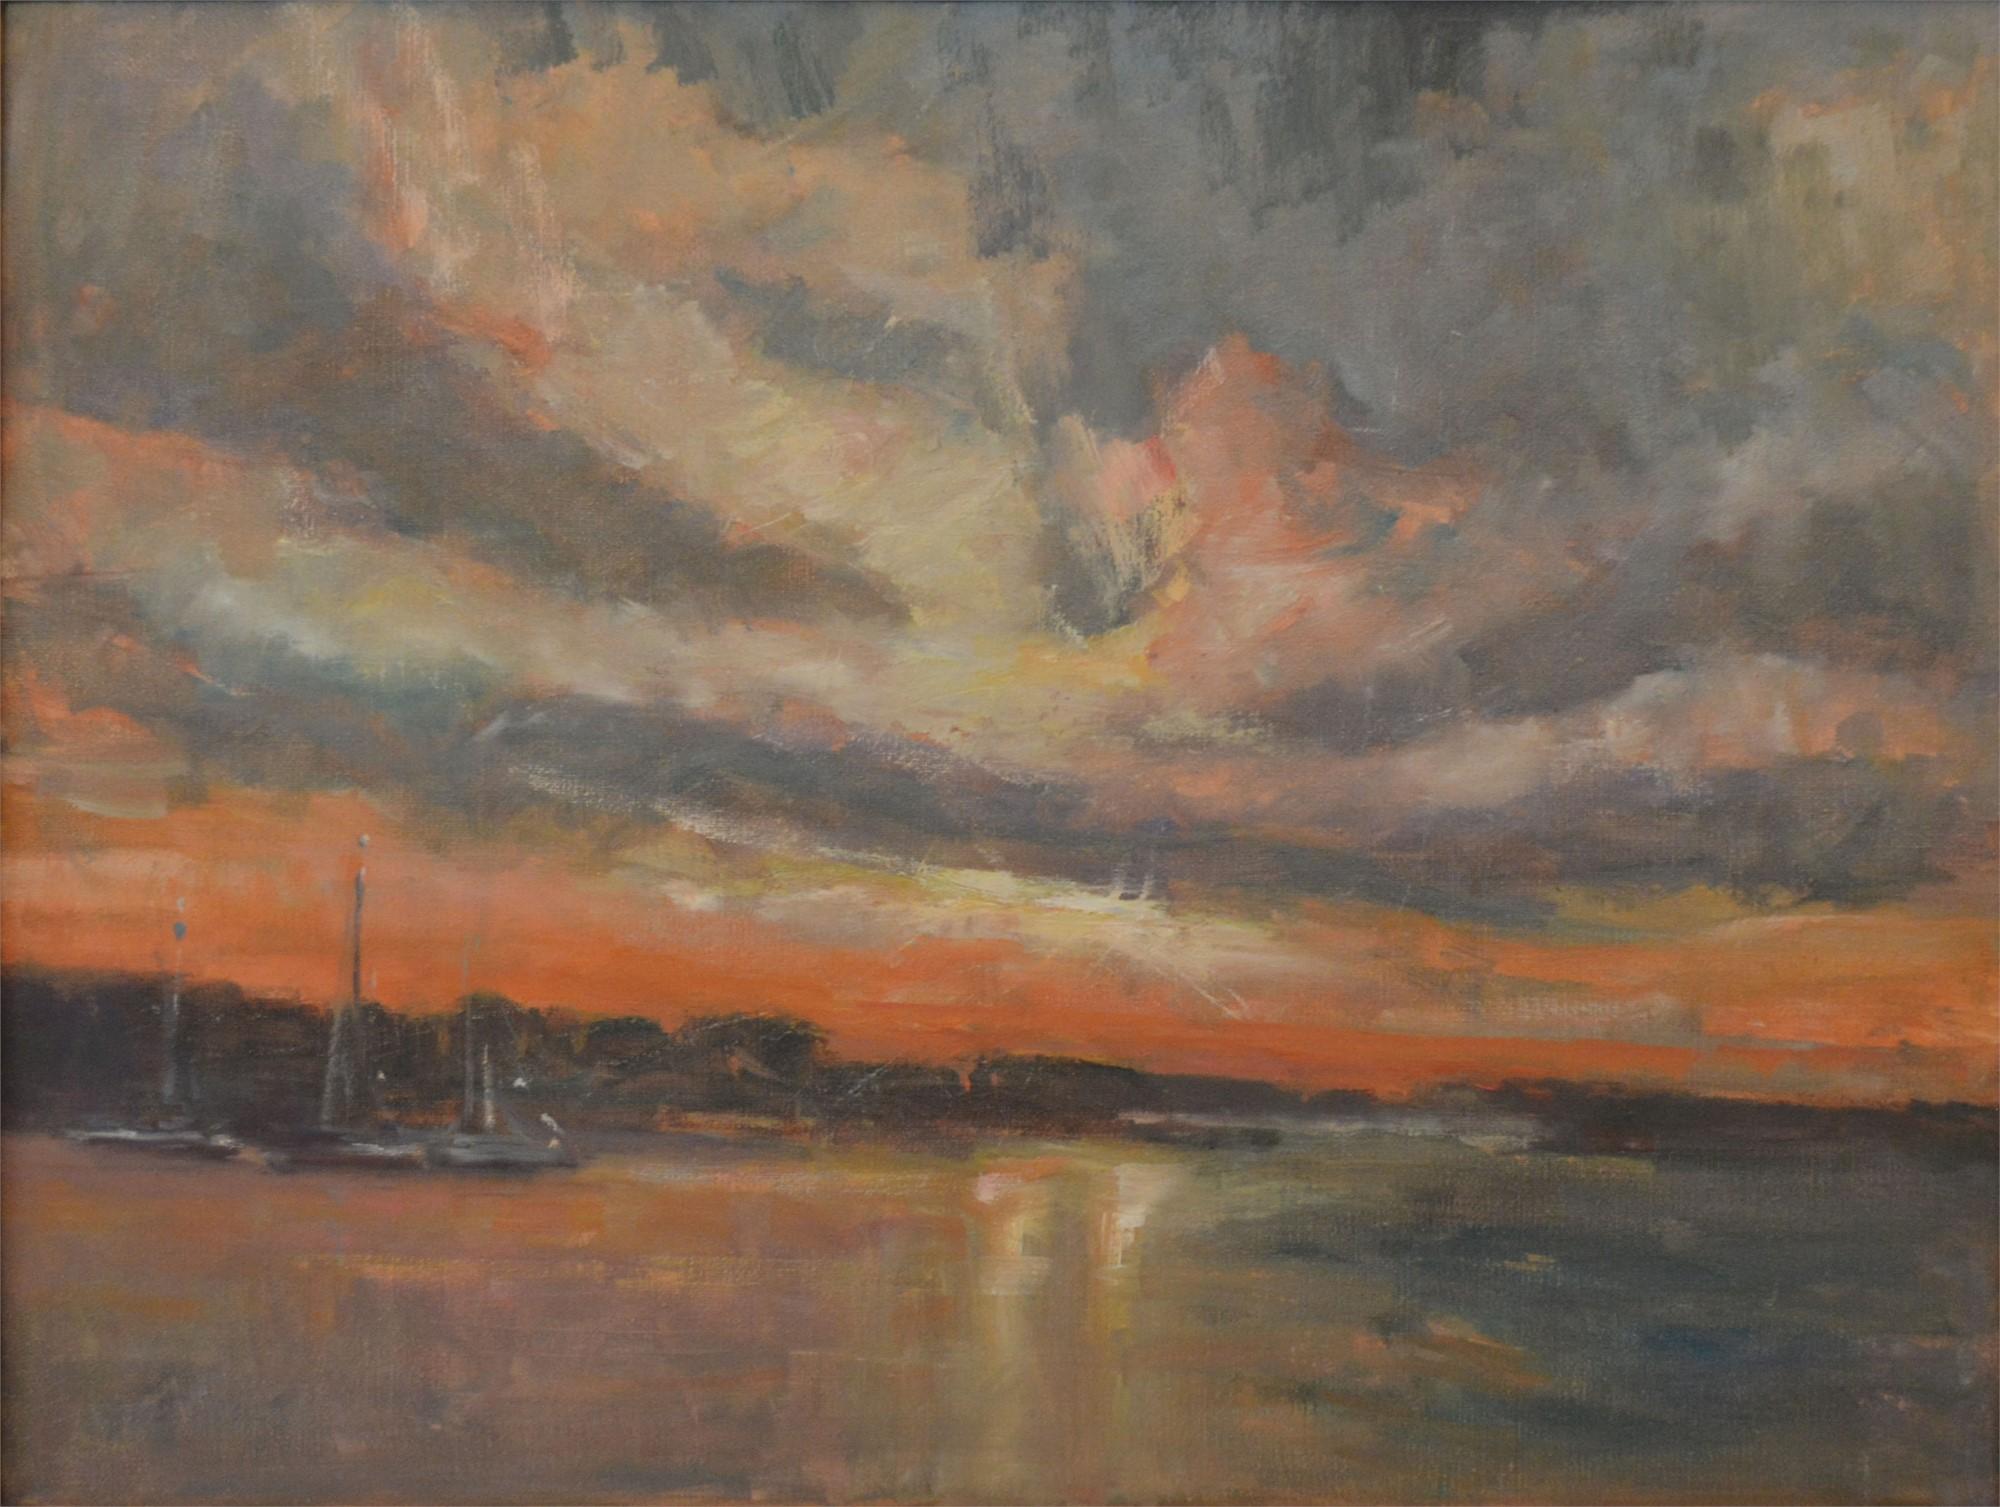 Early Light on the Harbor by Karen Hewitt Hagan